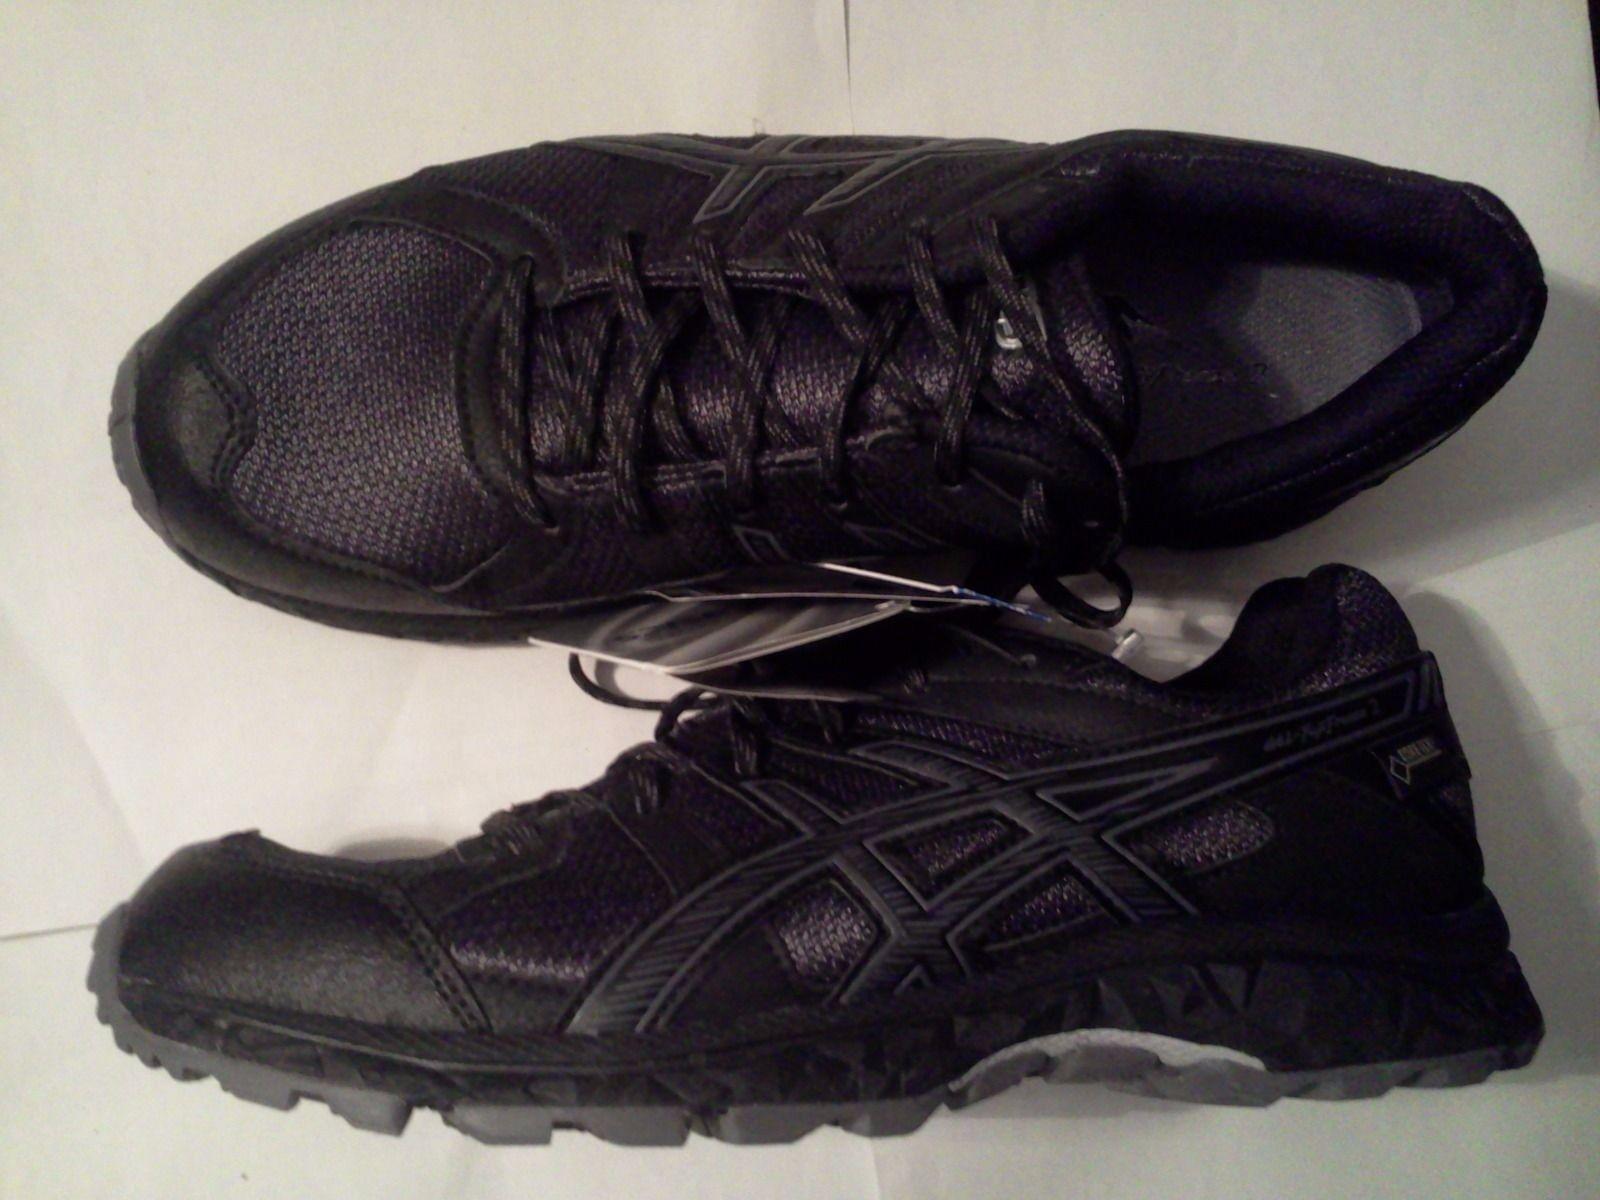 Neu Gr.39-40,5-41,5 ASICS-Gel-Goretex Damen Wander Walking Sport Schuhe schwarz